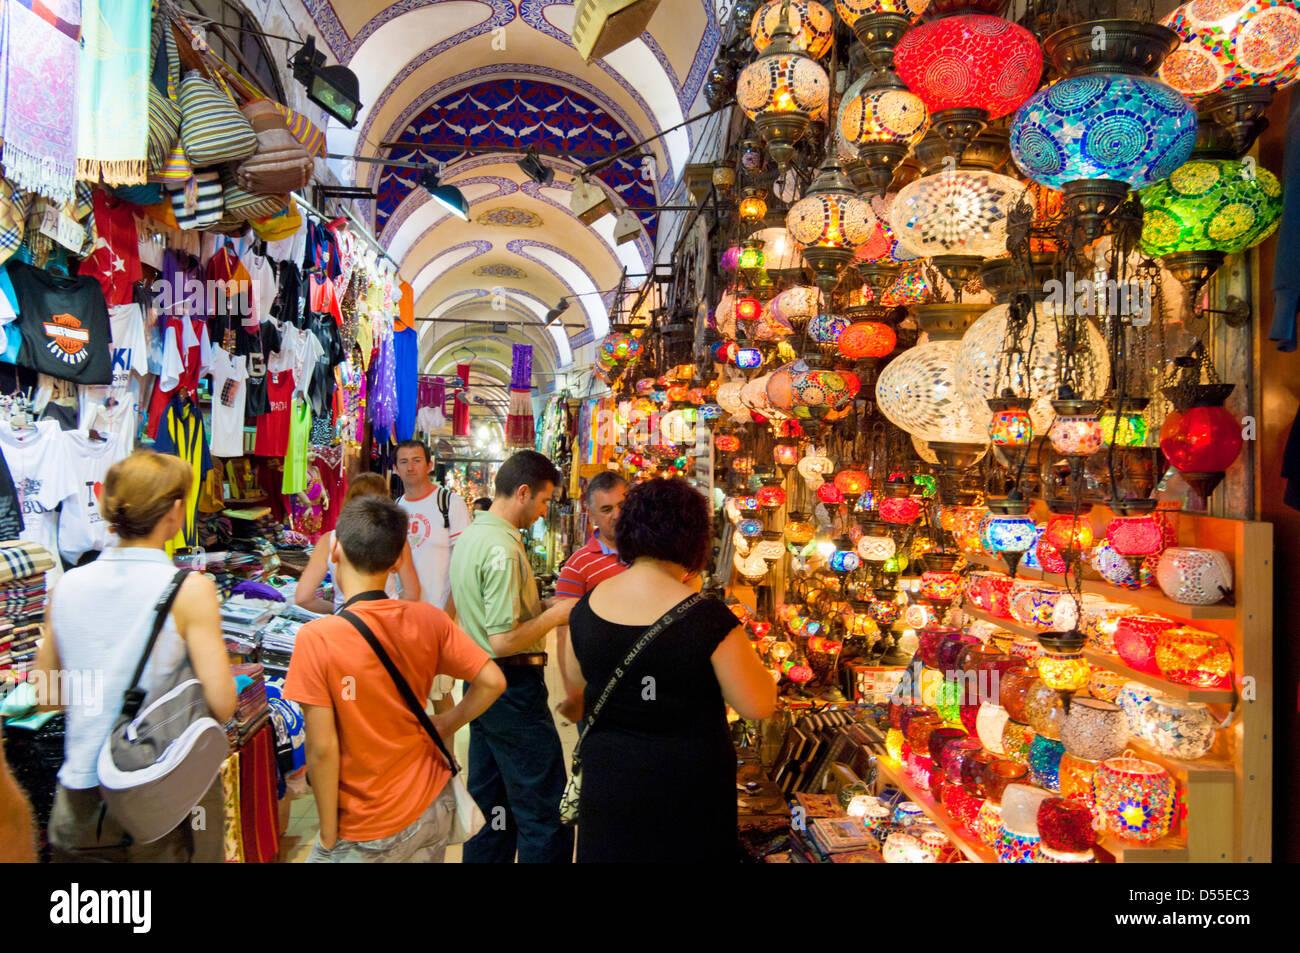 Tourists shopping in Grand Bazaar, Kapali Carsi, Sultanahmet, Istanbul, Turkey - Stock Image